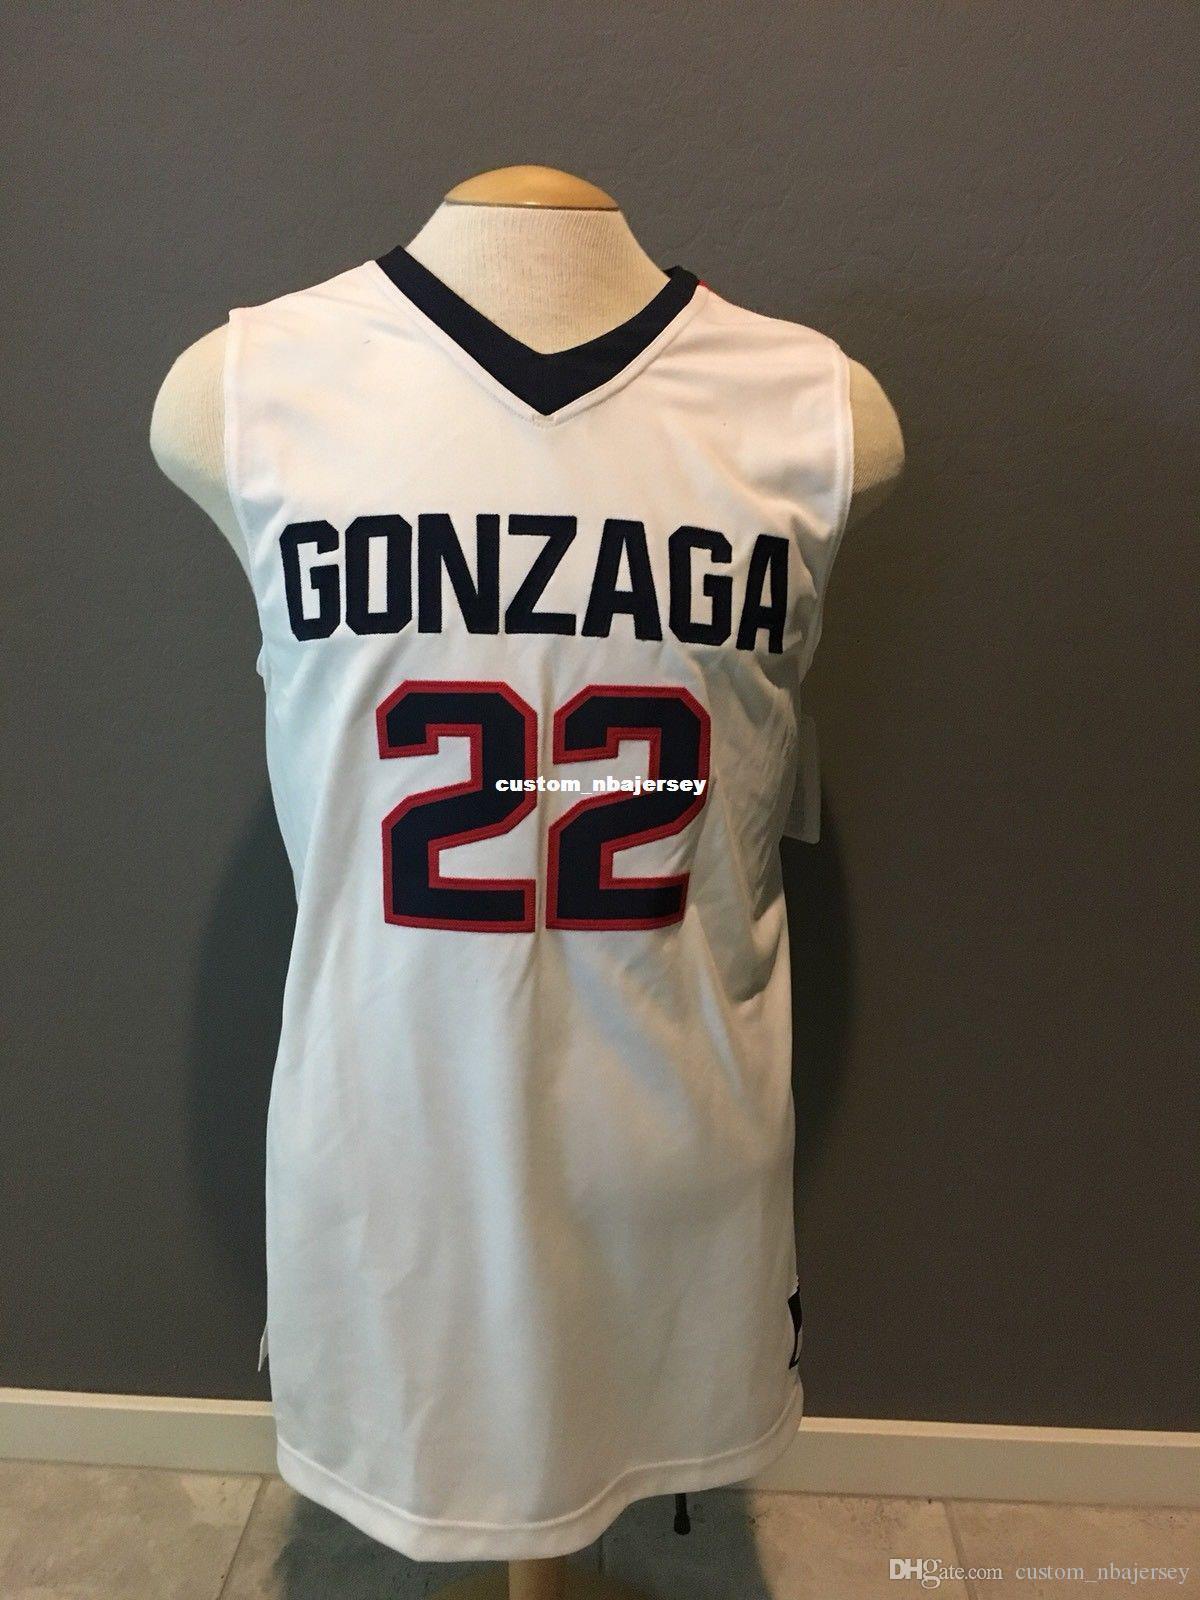 Cheap custom NEW Gonzaga Bulldogs Basketball Jersey Stitched Customize any number name MEN WOMEN YOUTH XS-5XL